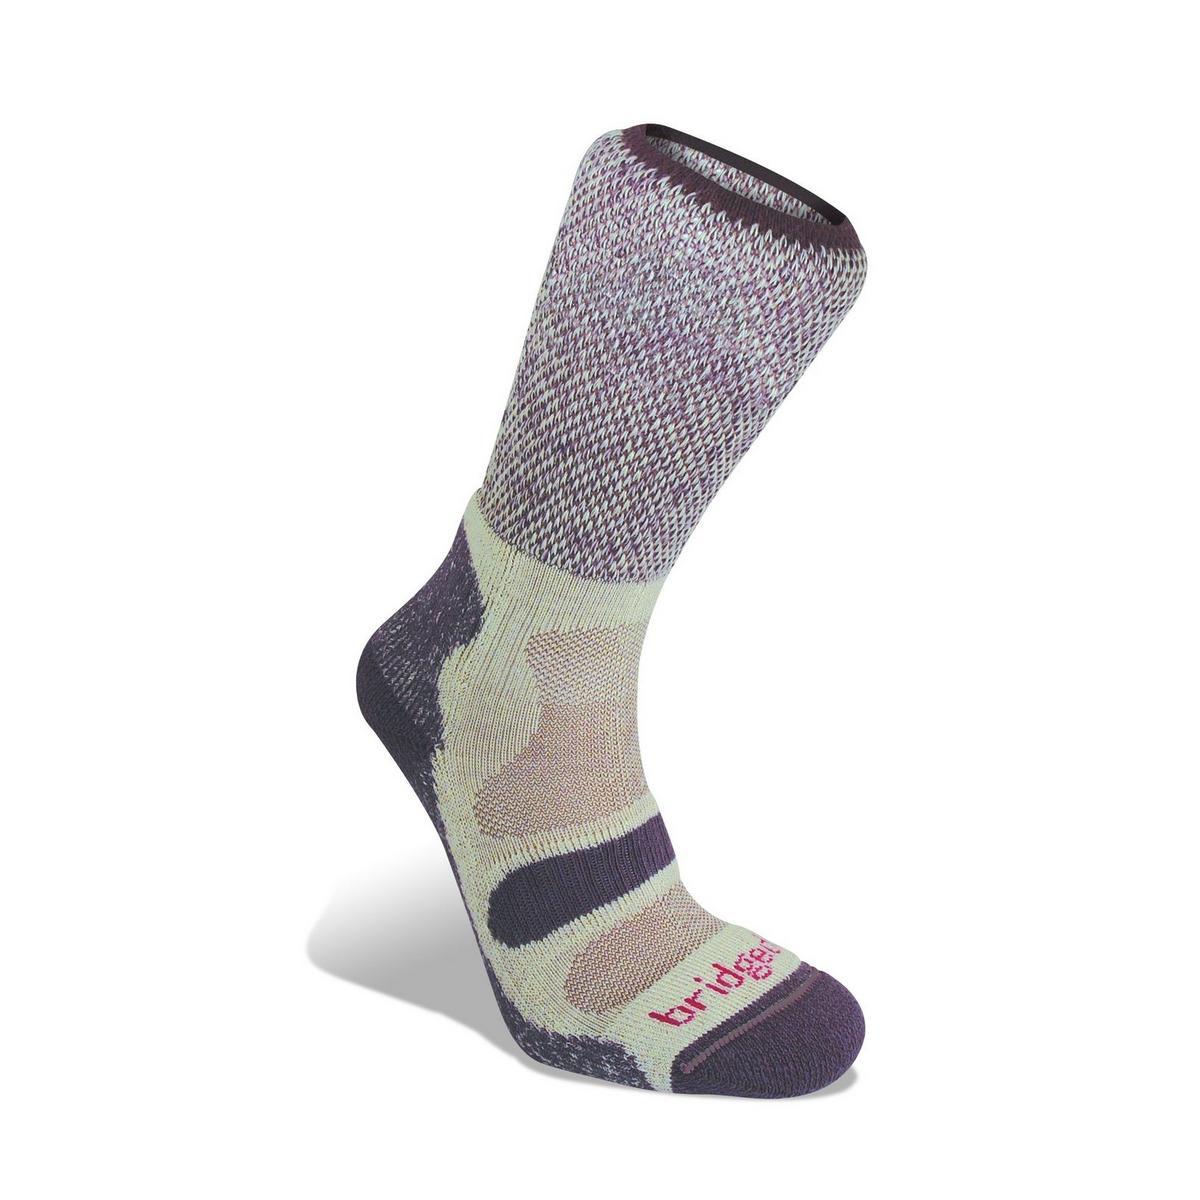 Bridgedale Women's Cotton Cool Hike Lightweight Socks